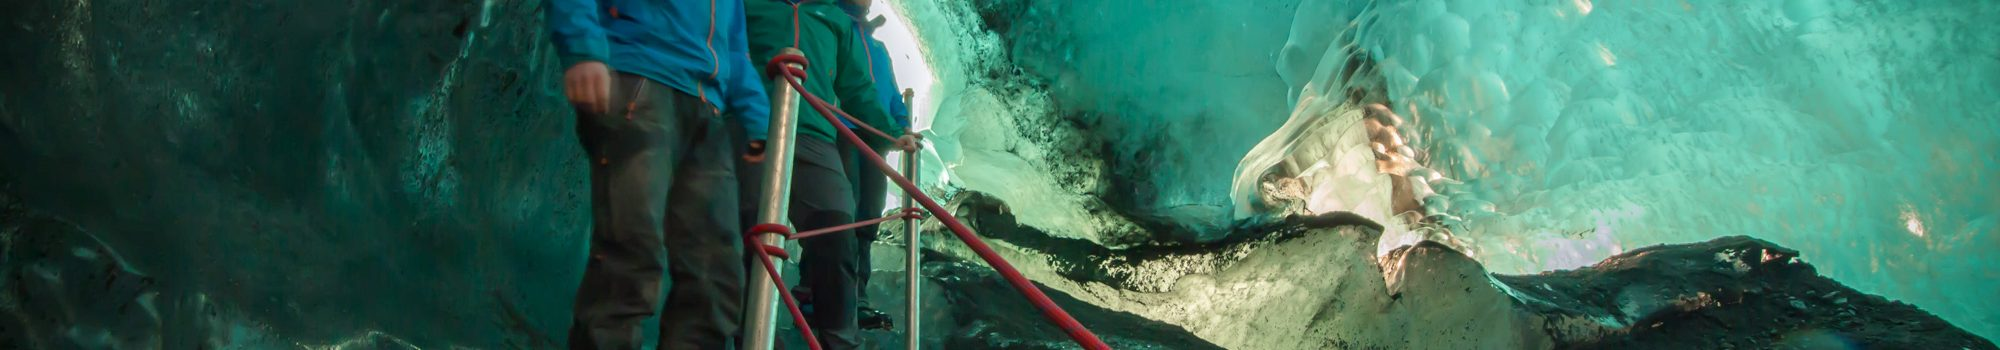 Ice-Cave-Tour-Vatnajokull-Iceland